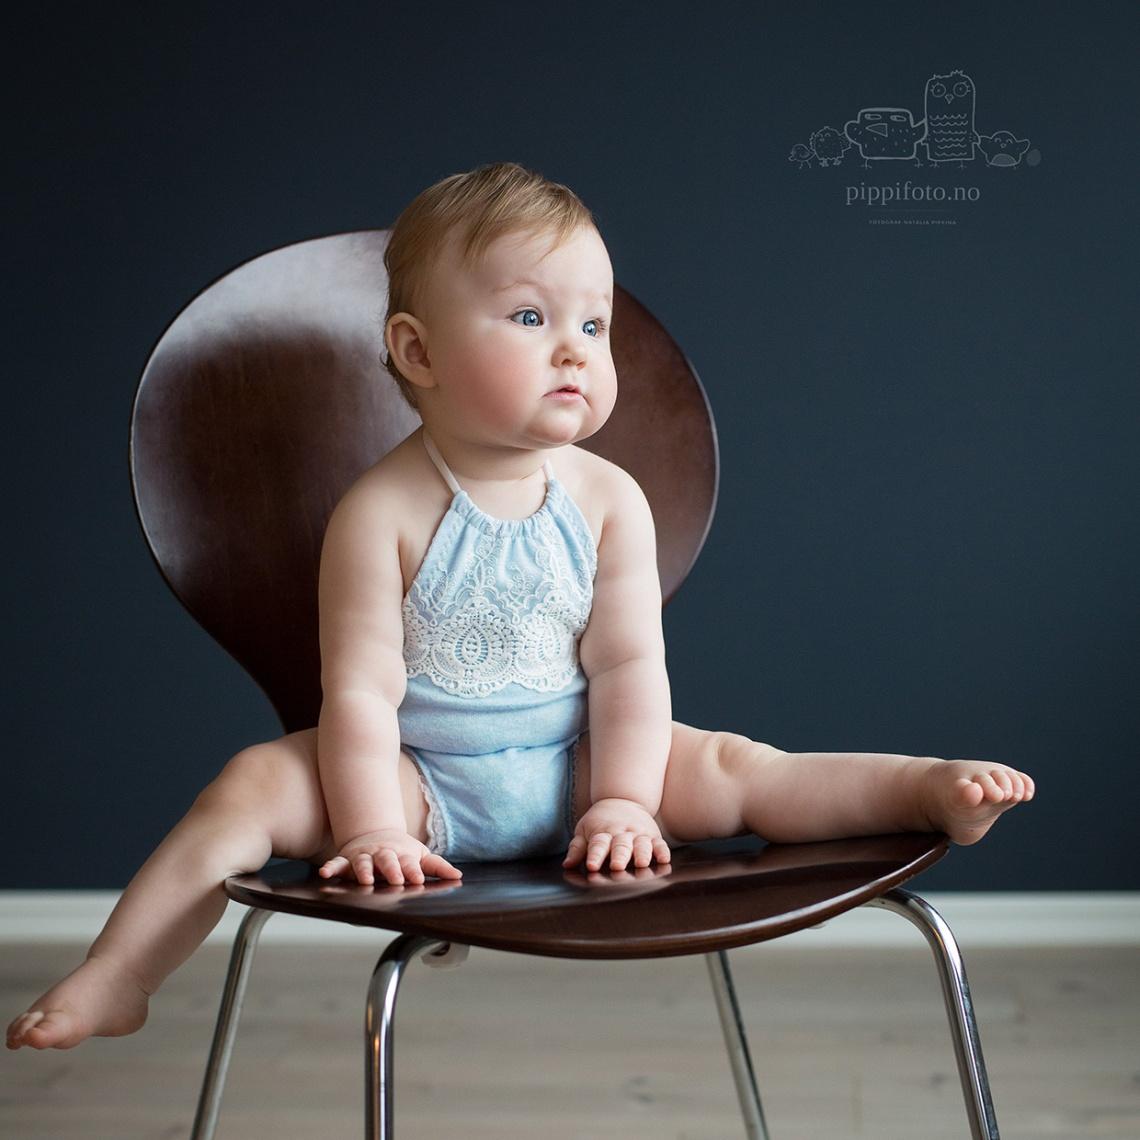 hjemmefotografering-babyfoto-babybilder-barnefotografering